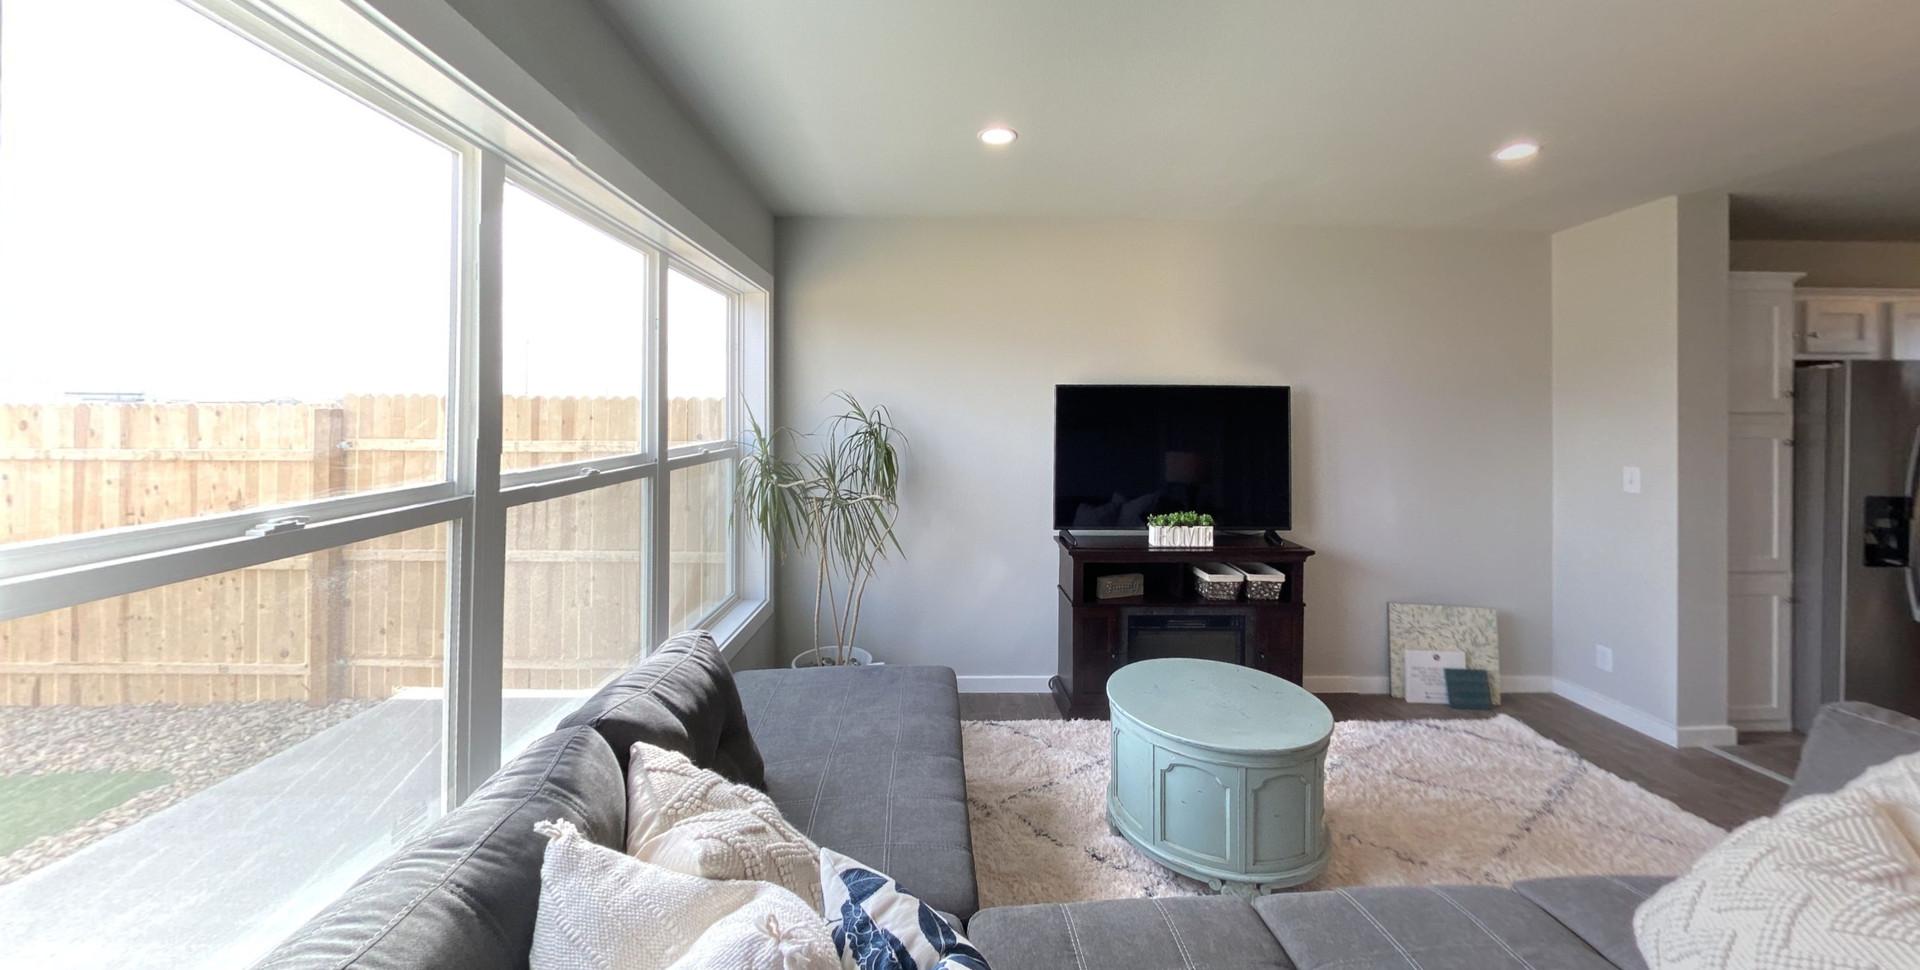 310-Omnia-Living-Room(1).jpg